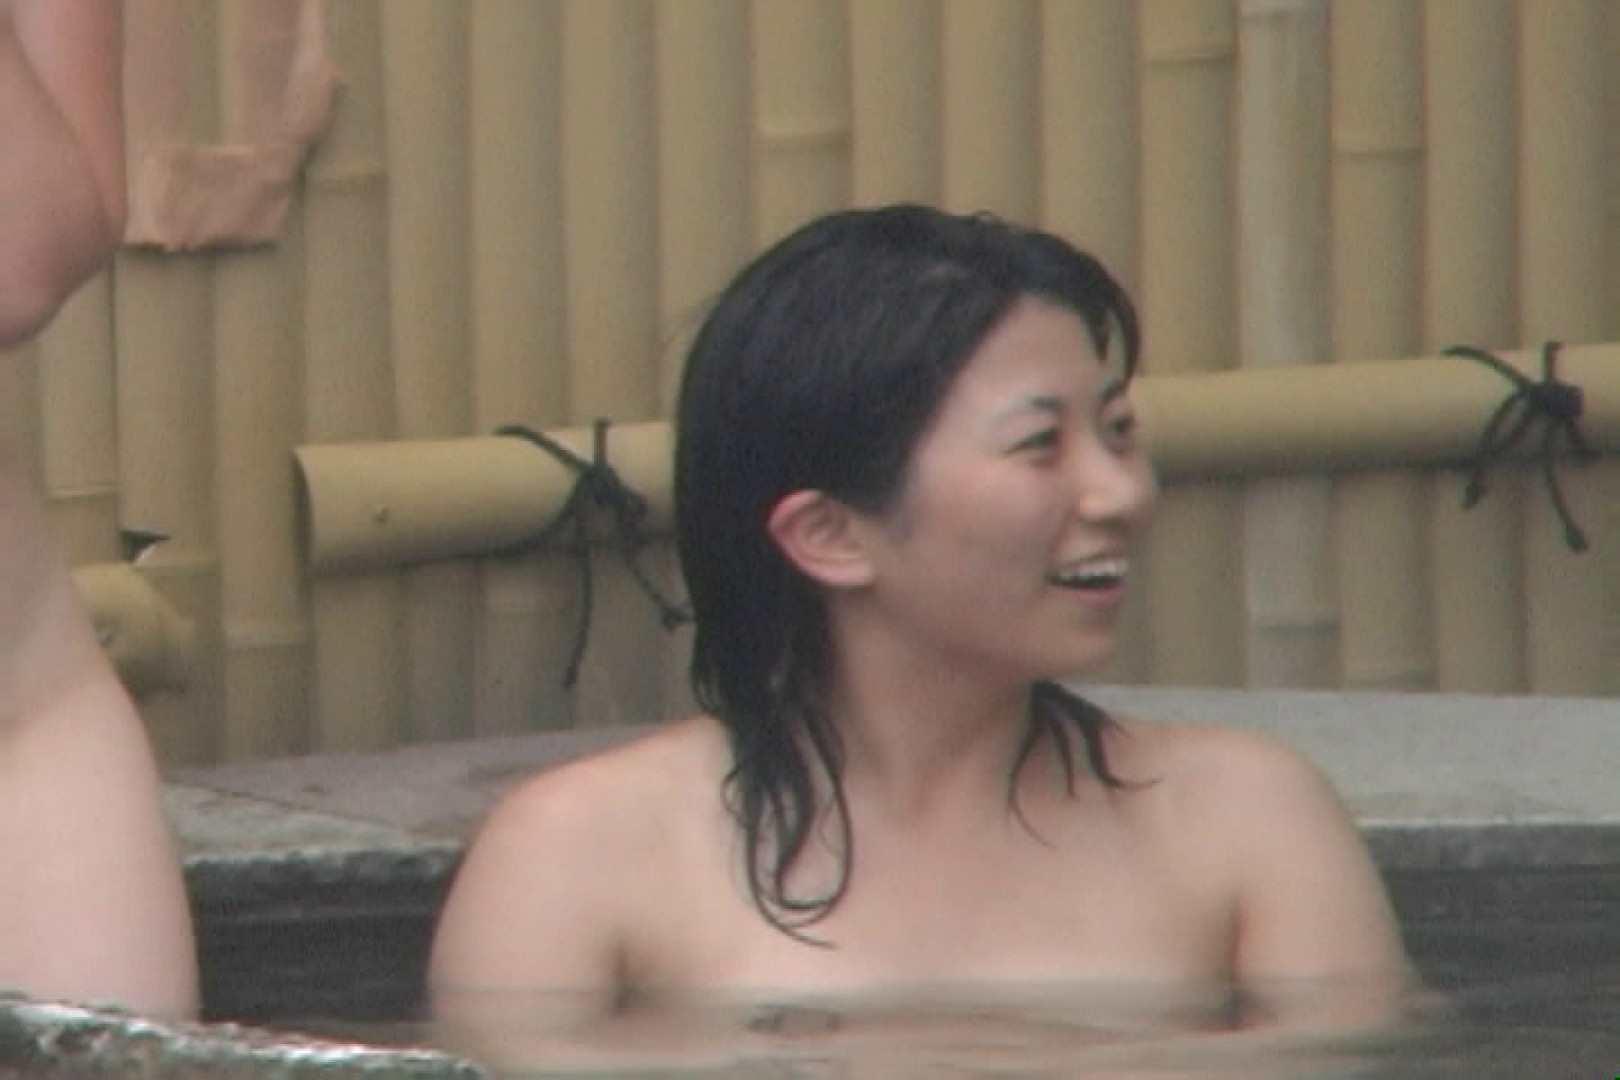 Aquaな露天風呂Vol.43【VIP限定】 露天 のぞき動画画像 88画像 62